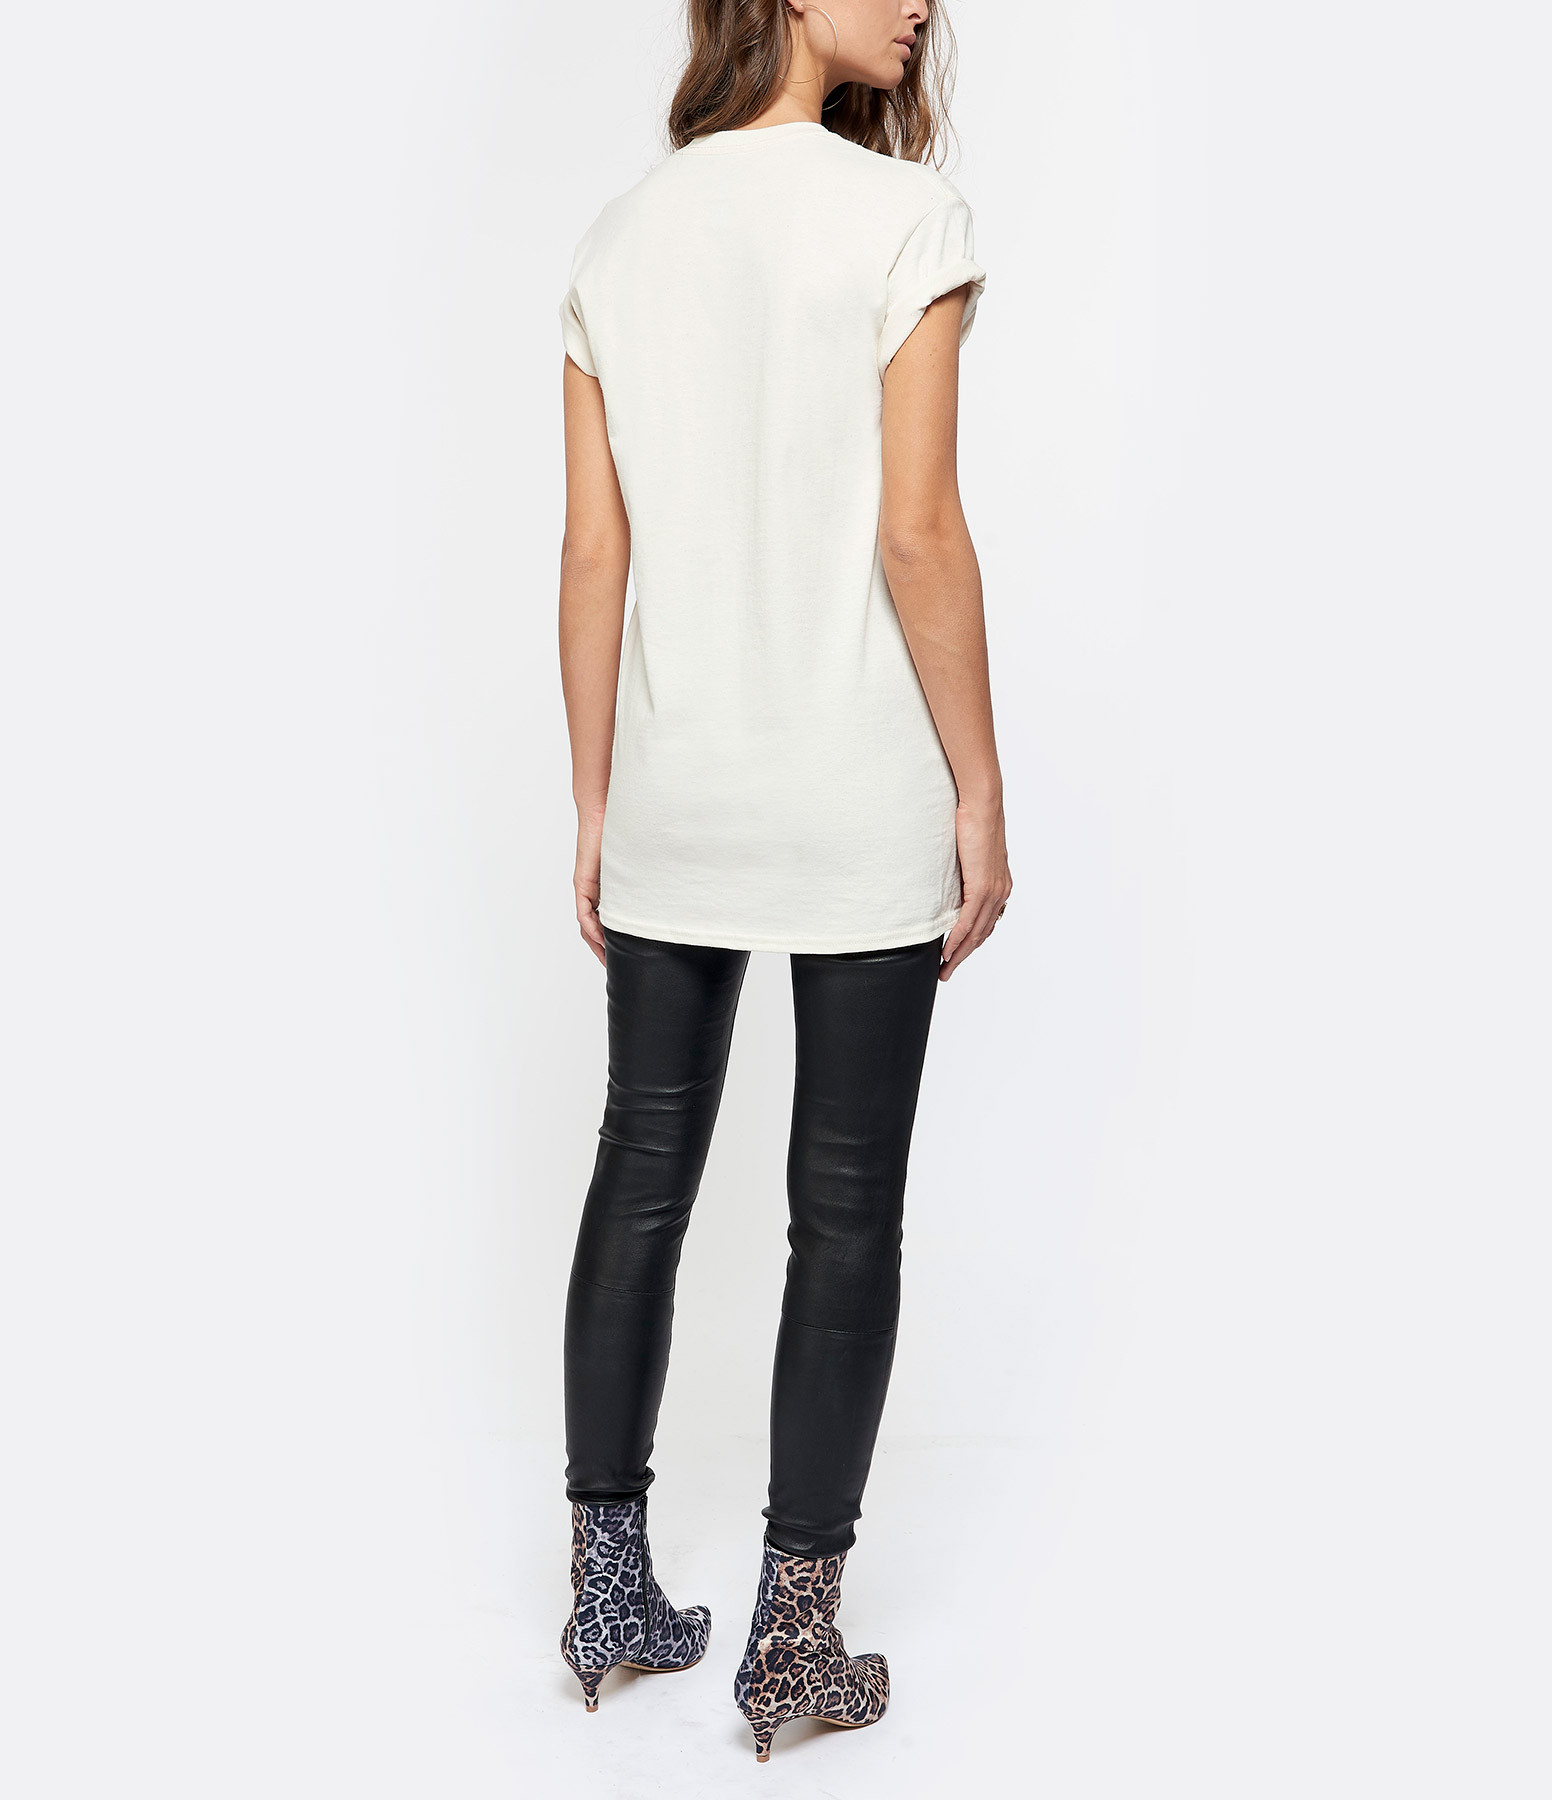 NEWTONE - Tee-shirt Galaxy Club Coton Naturel